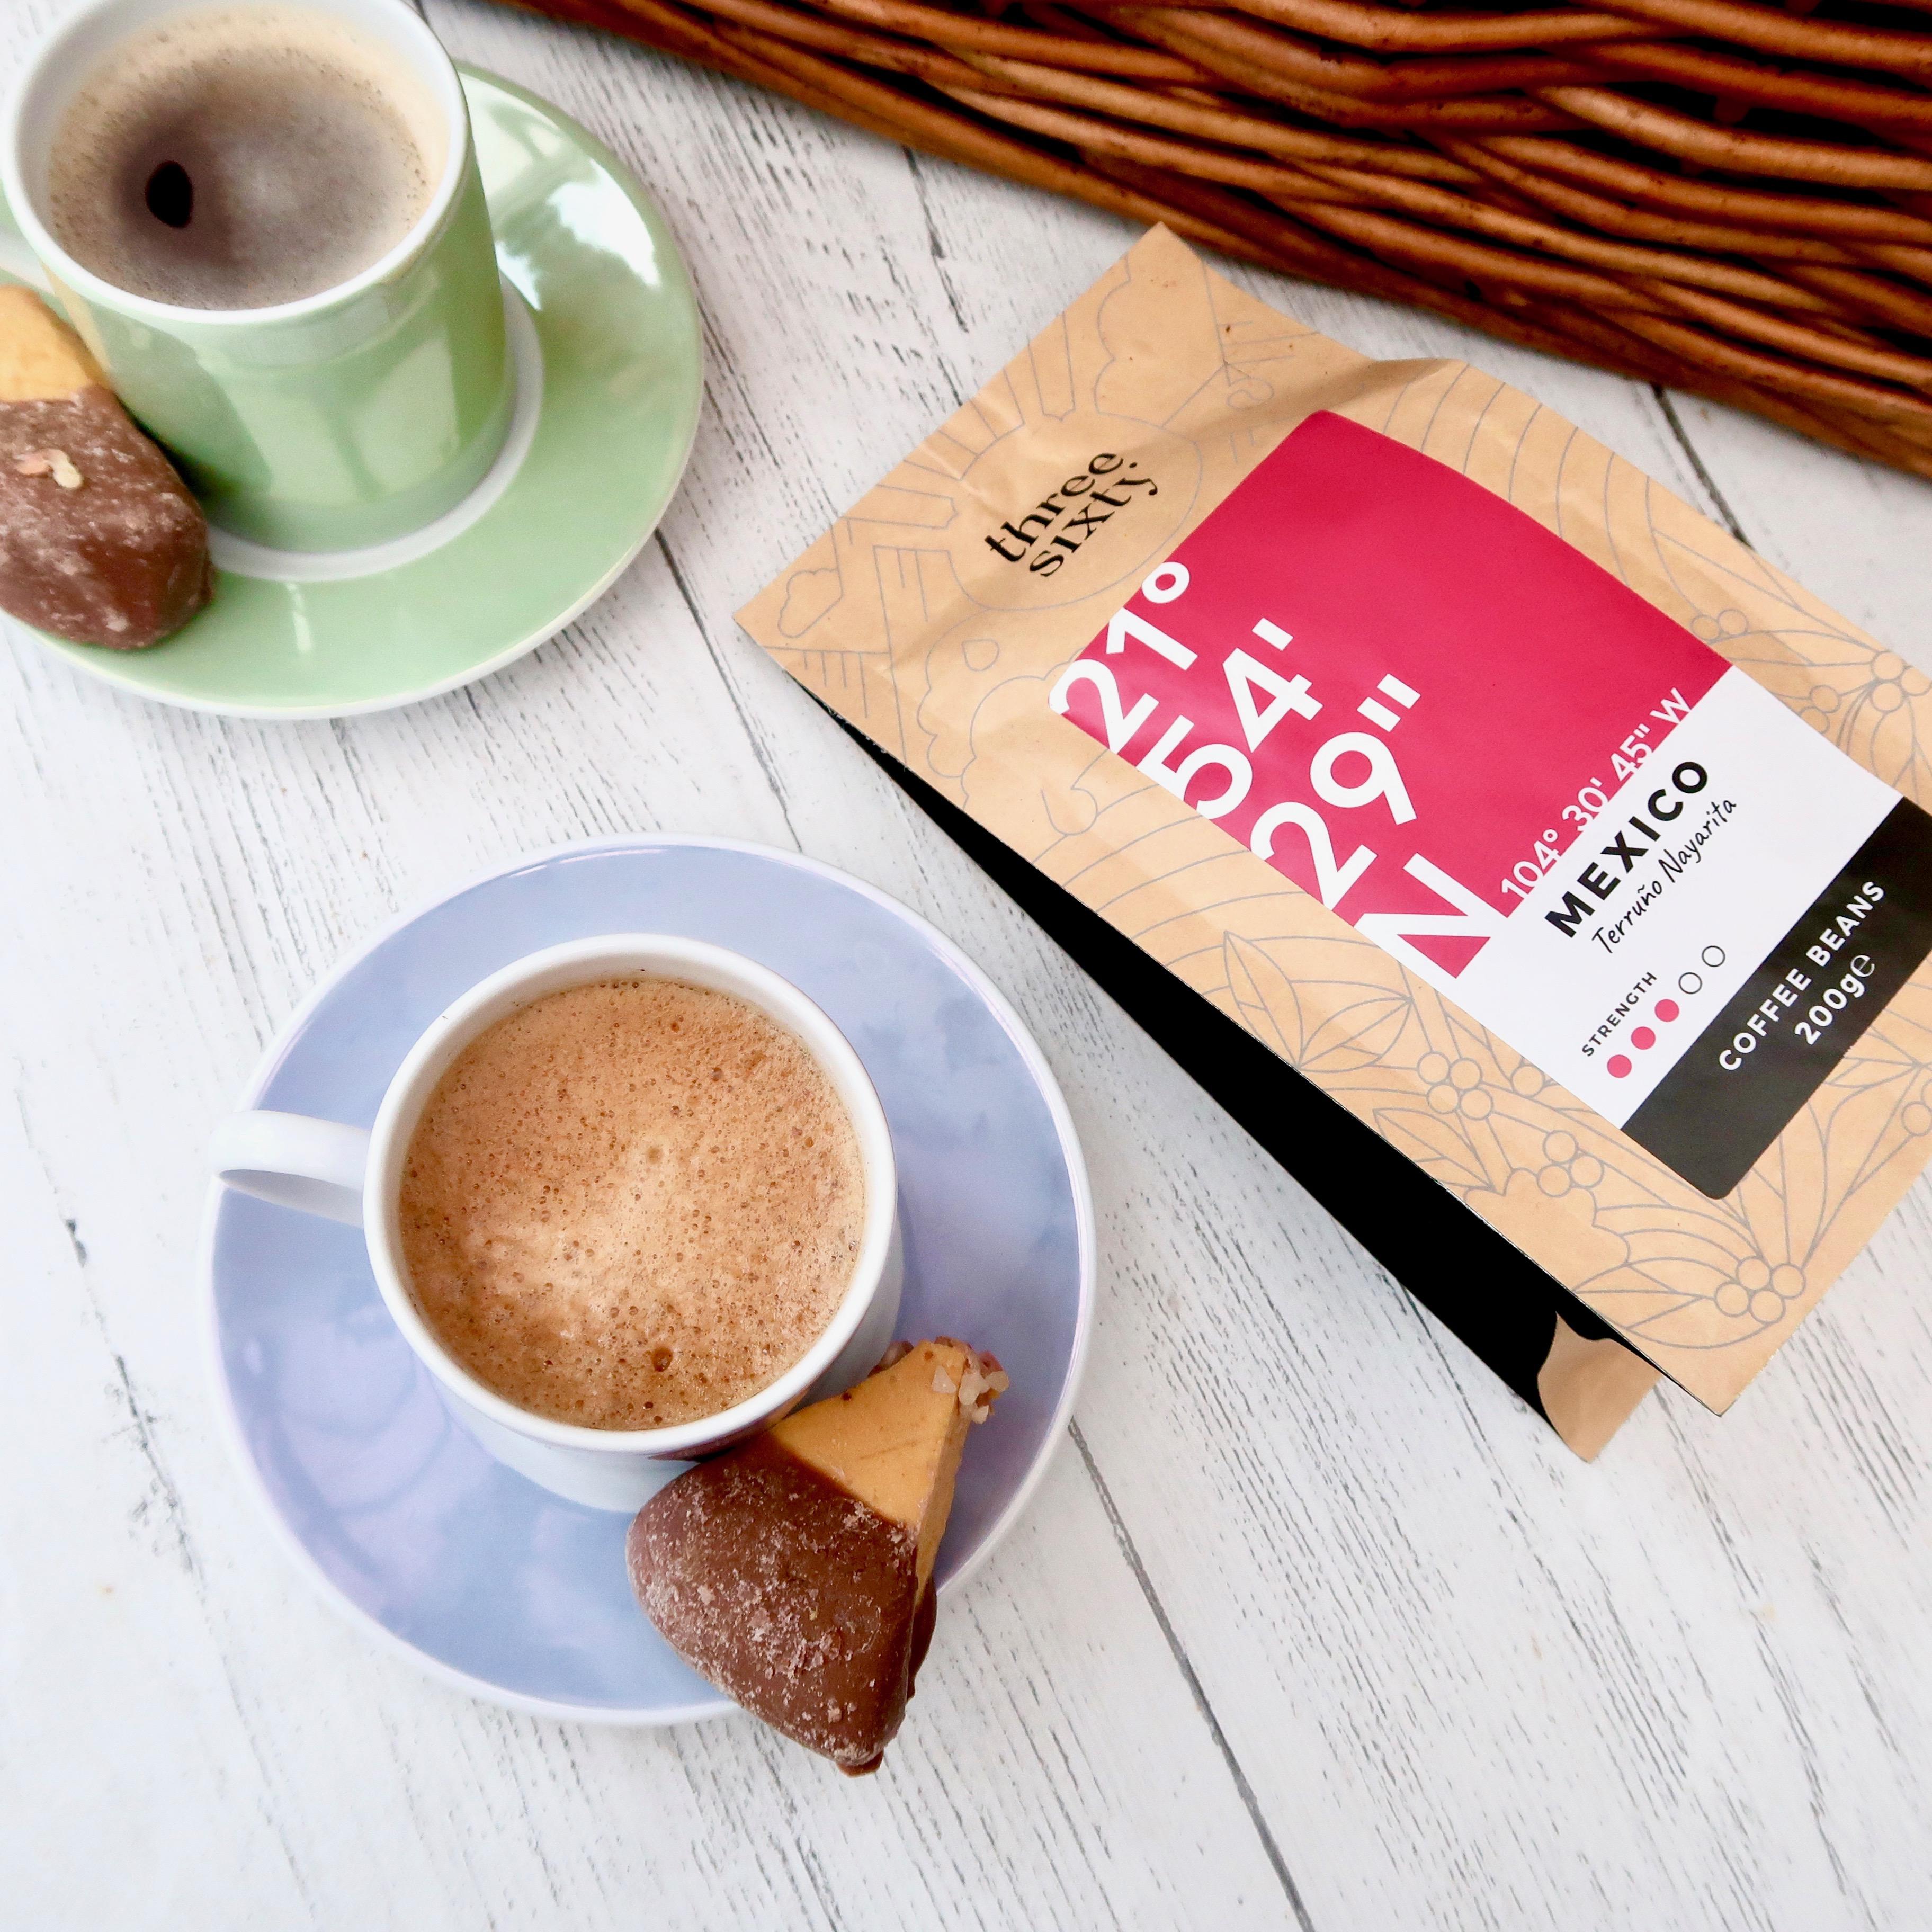 ThreeSixty° Coffee - Fair Trade and Organic Coffee from Peru, Cuba and Mexico 5